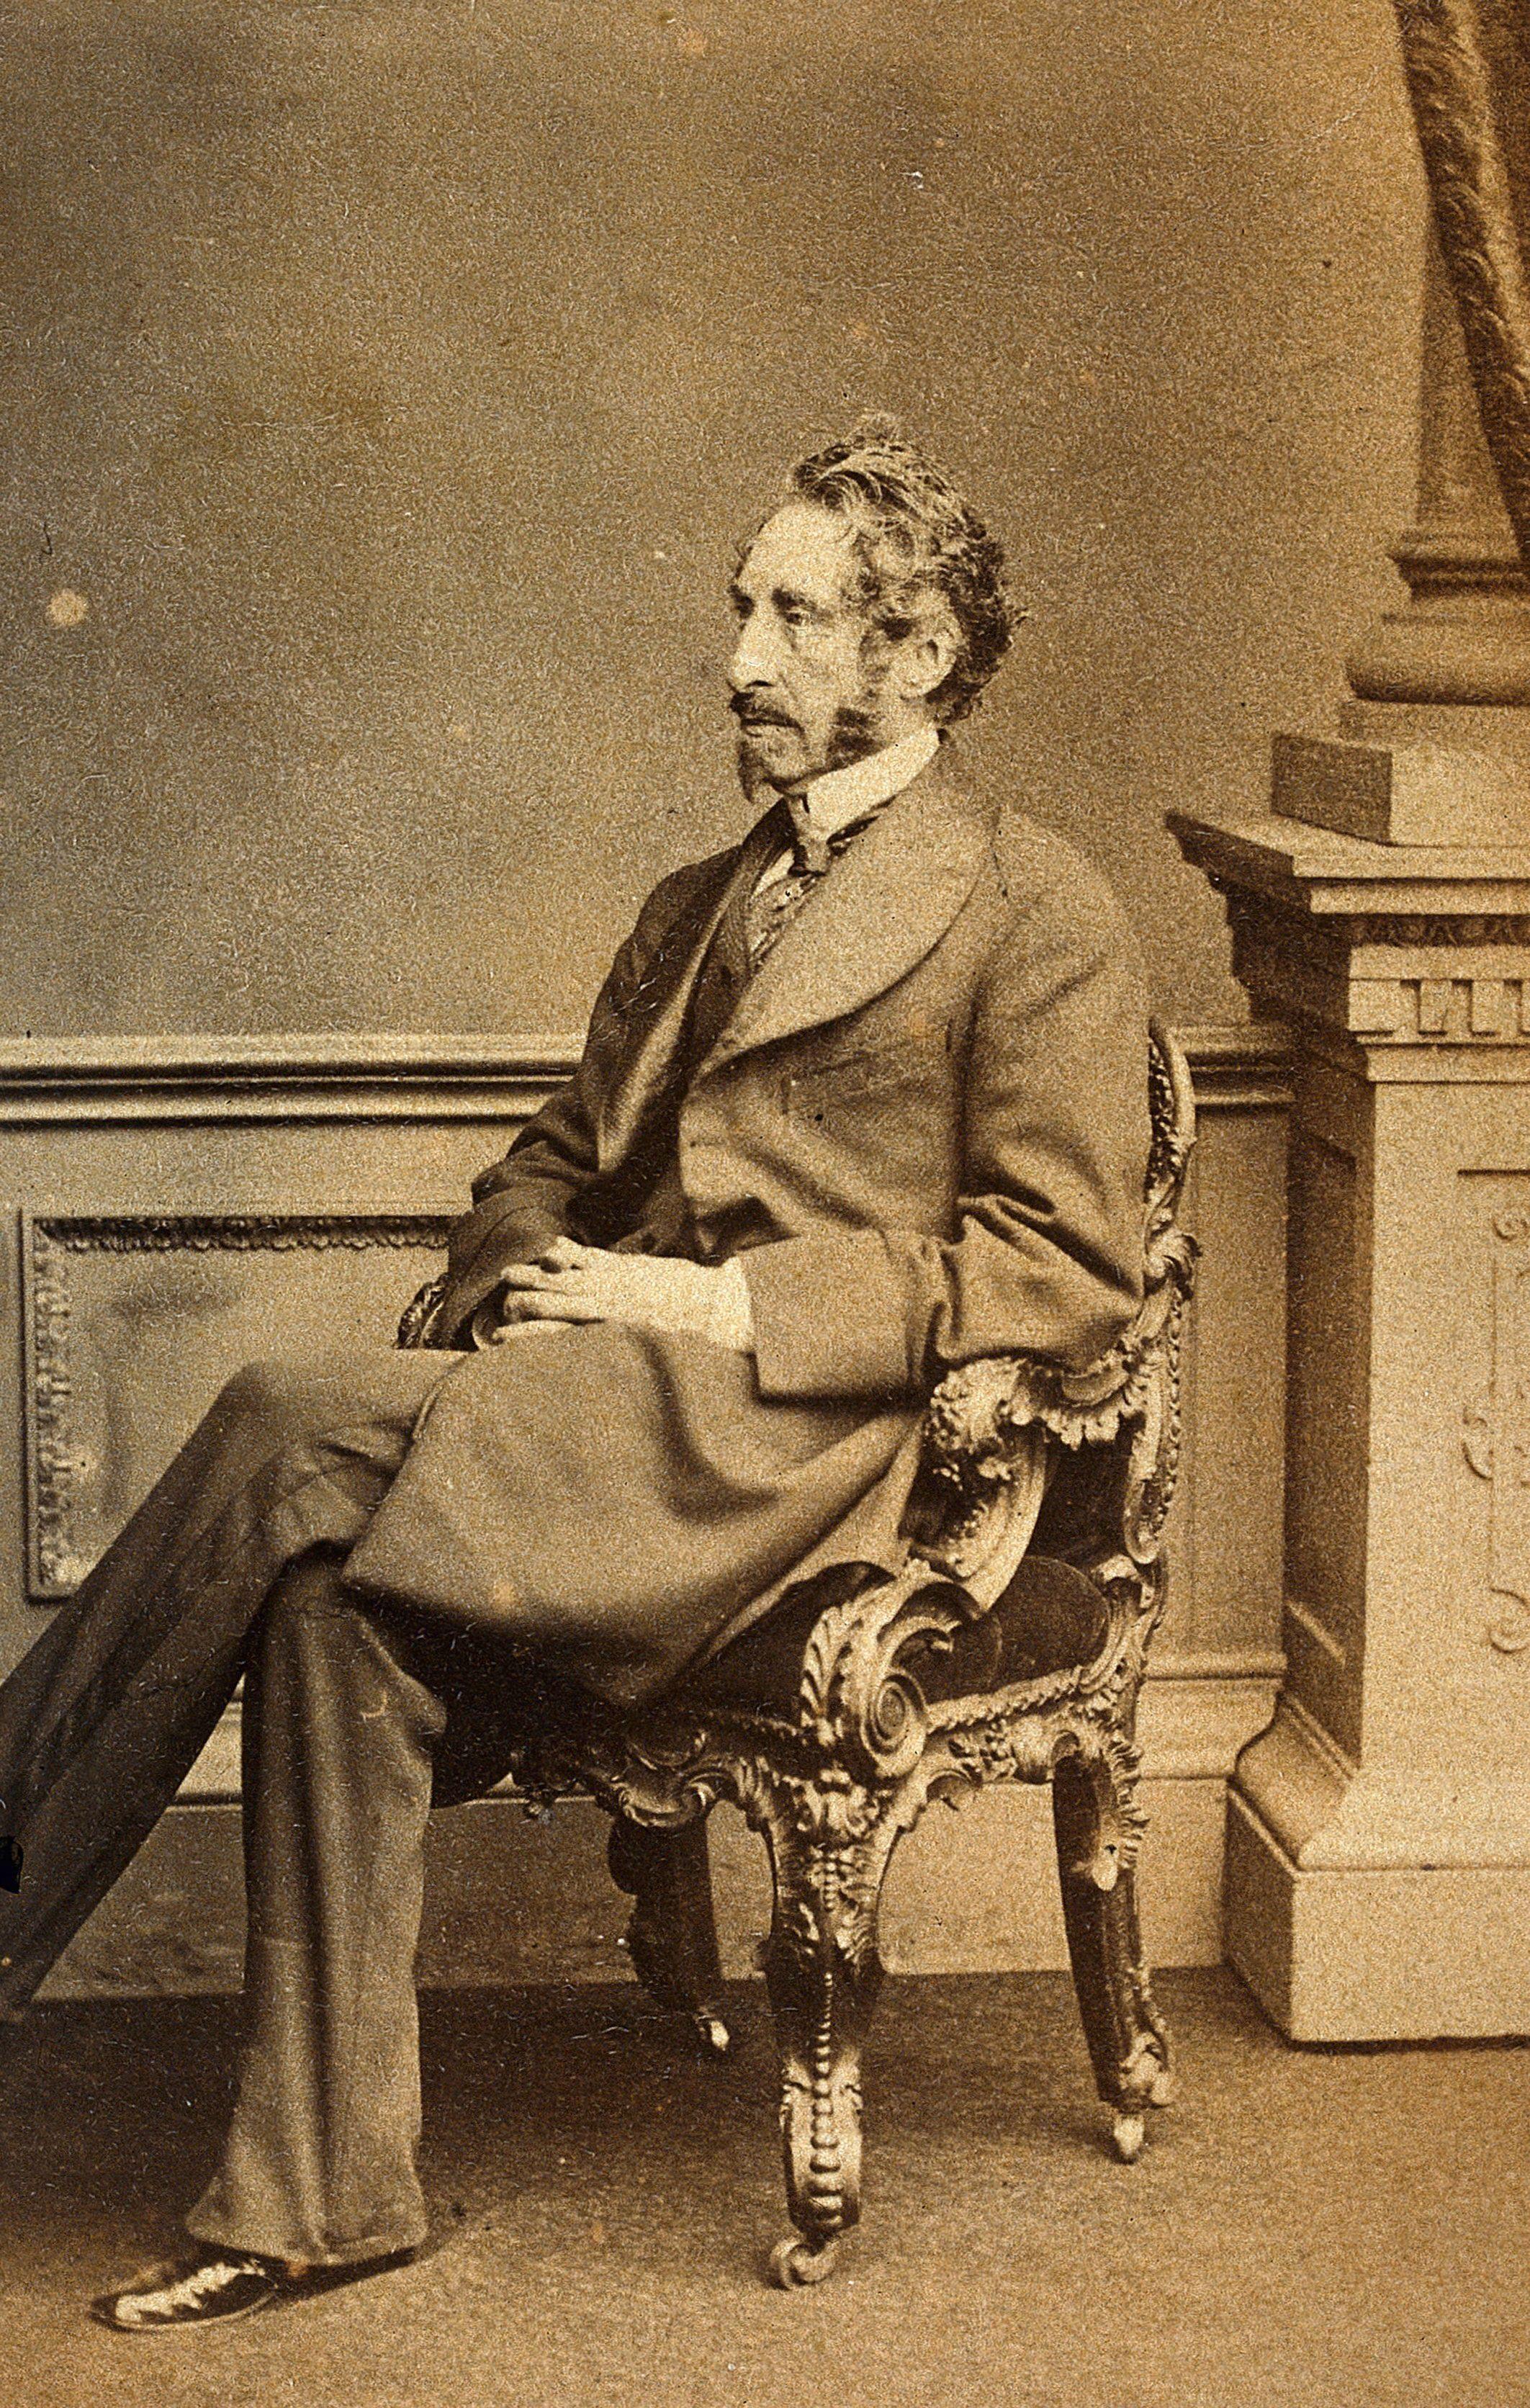 Sir Edward Bulwer Lytton. Photograph. | Wellcome Collection